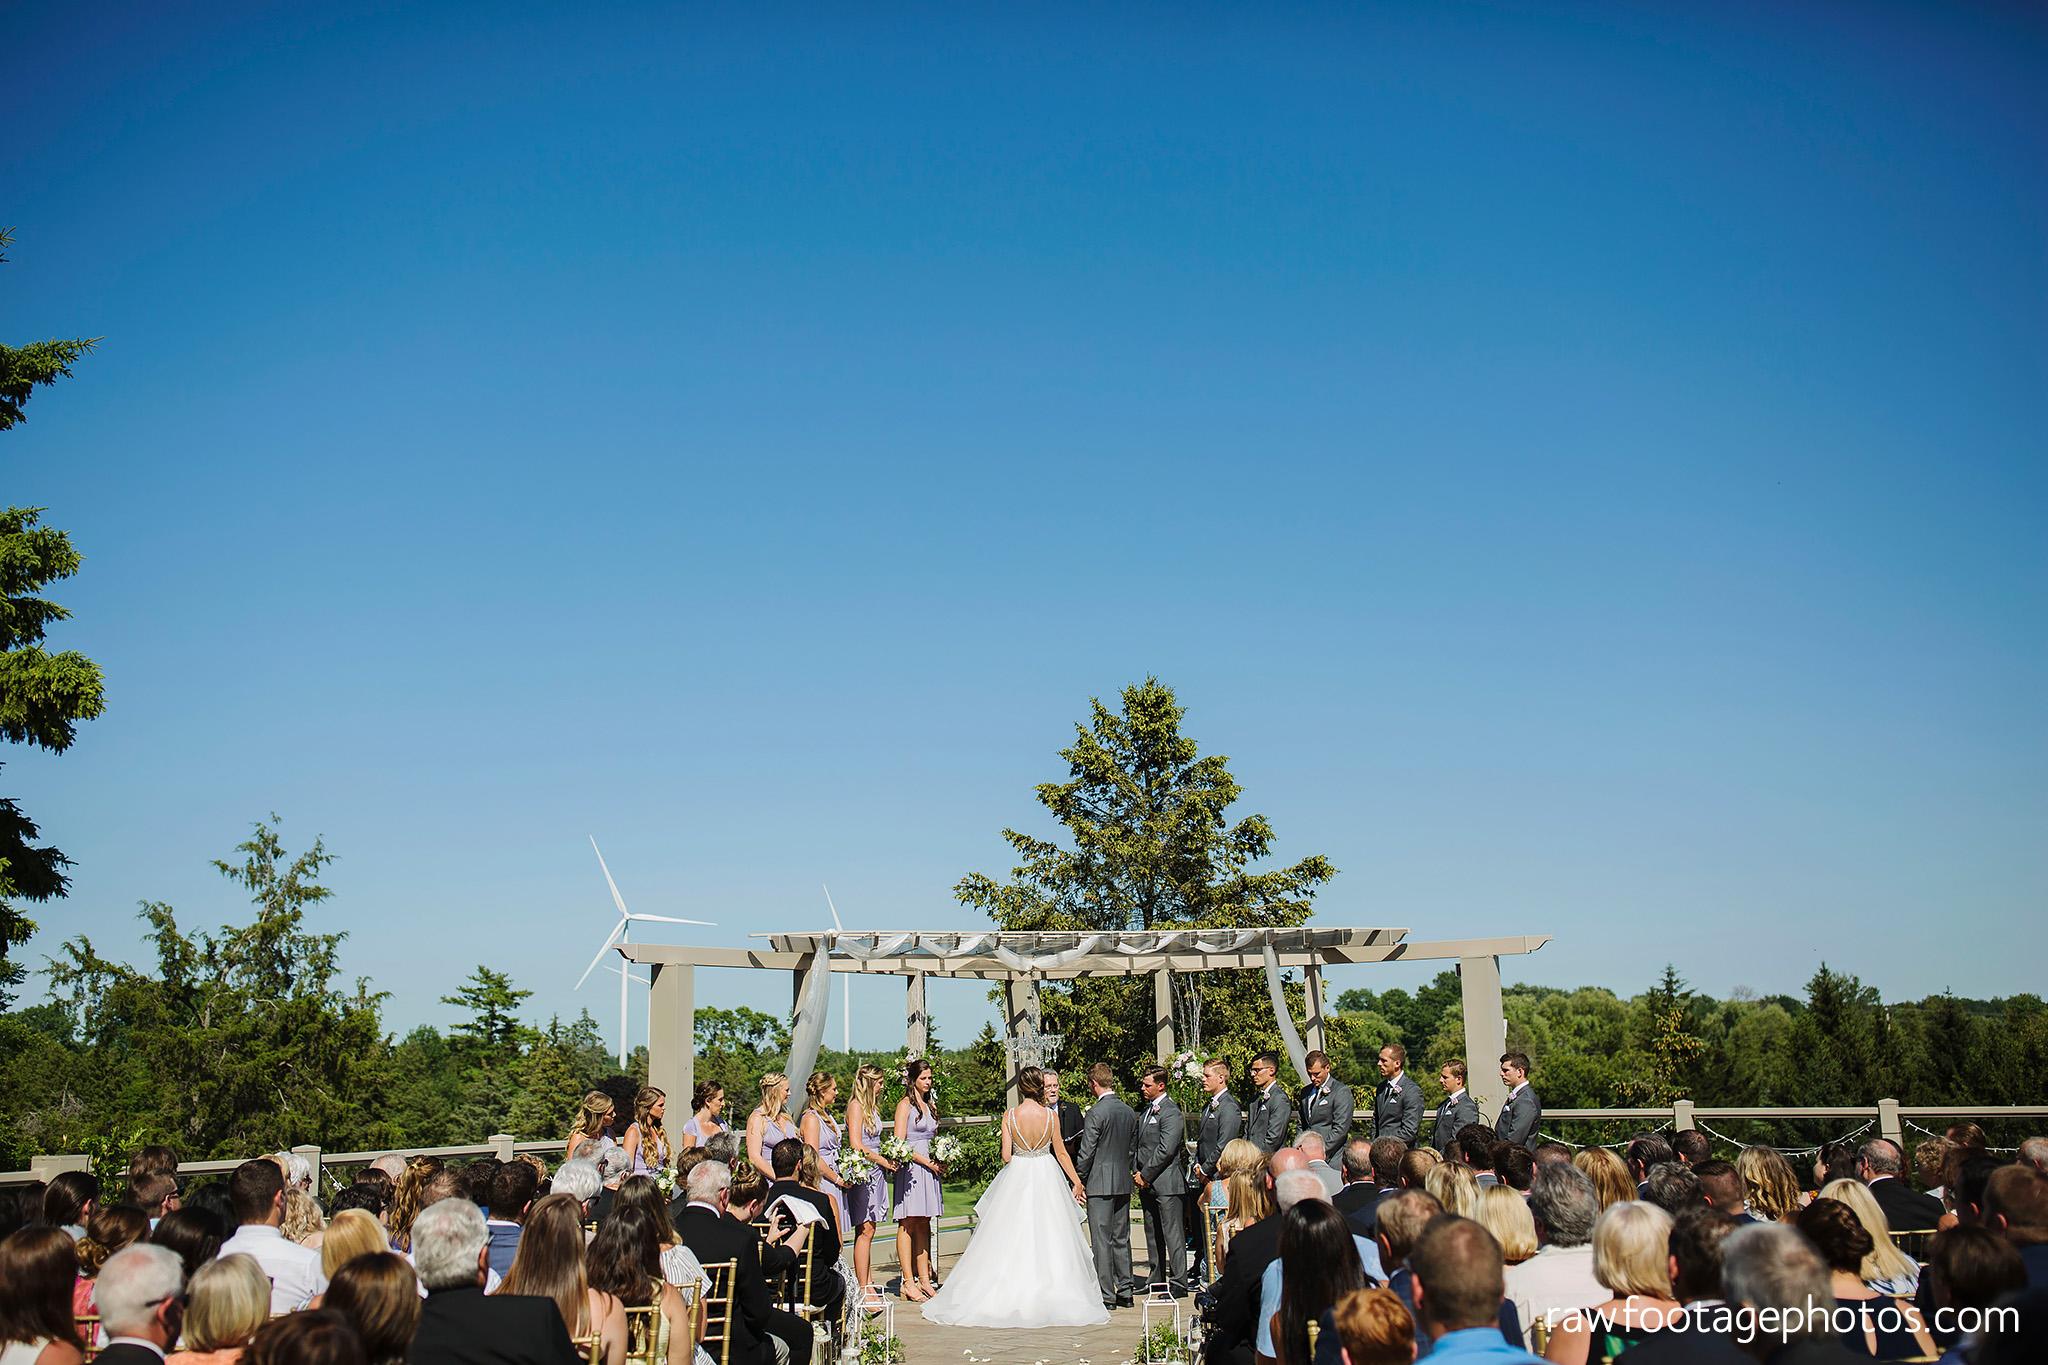 london_ontario_wedding_photographer-grand_bend_wedding_photographer-oakwood_resort_wedding-beach_wedding-sunset_wedding-raw_footage_photography033.jpg